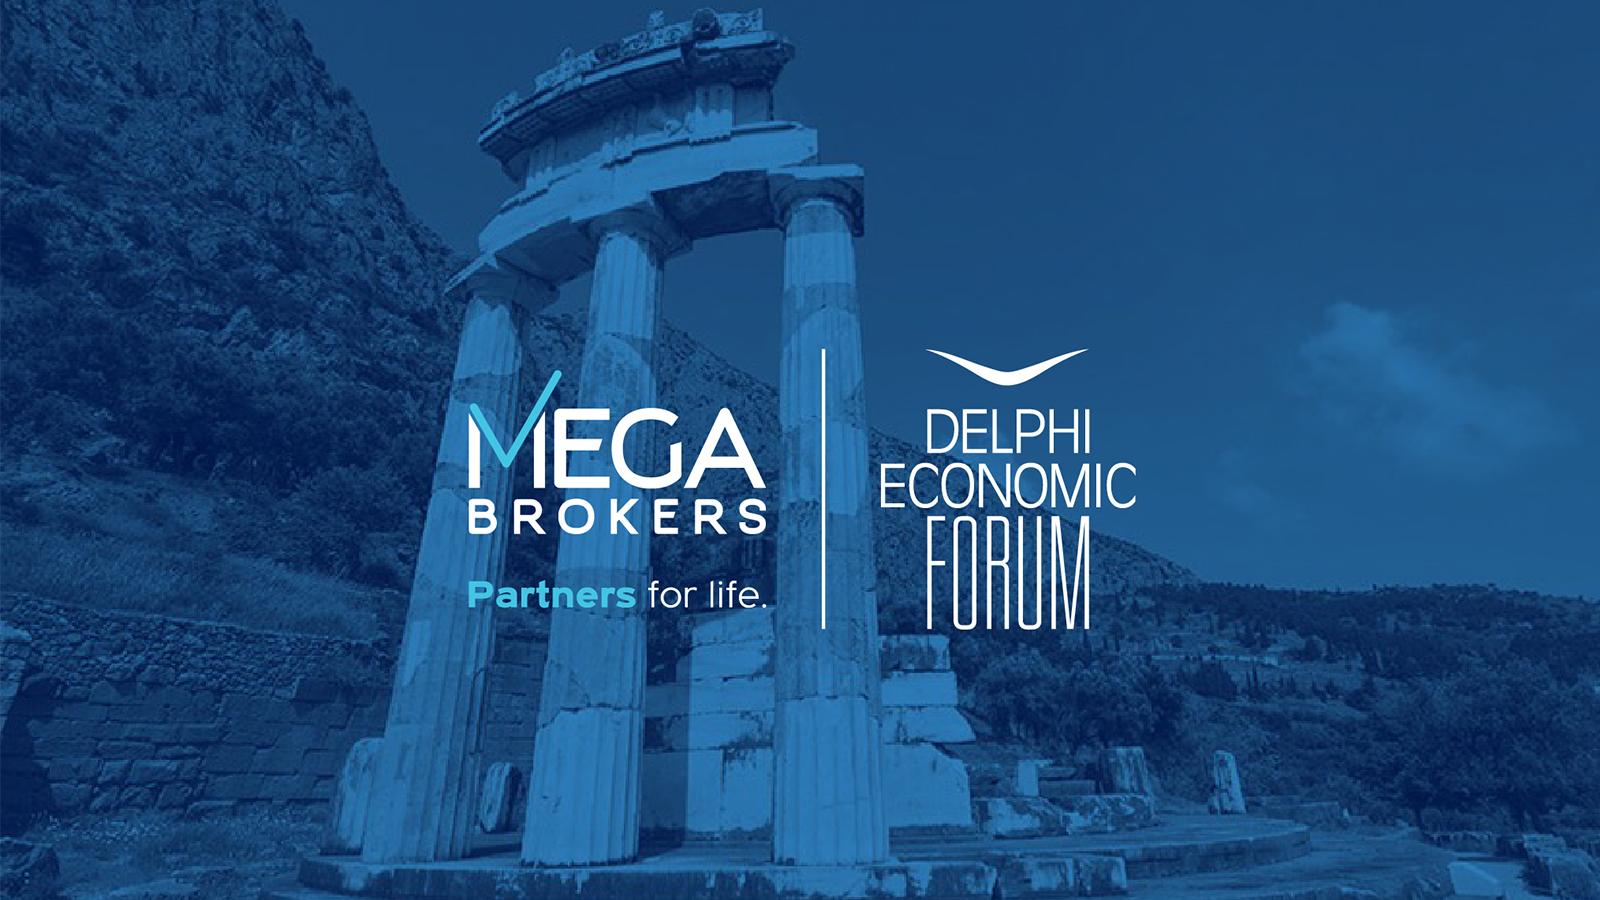 Tην ασφάλιση του Delphi Economic Forum ανέλαβε για 4η συνεχή χρονιά η Mega Brokers